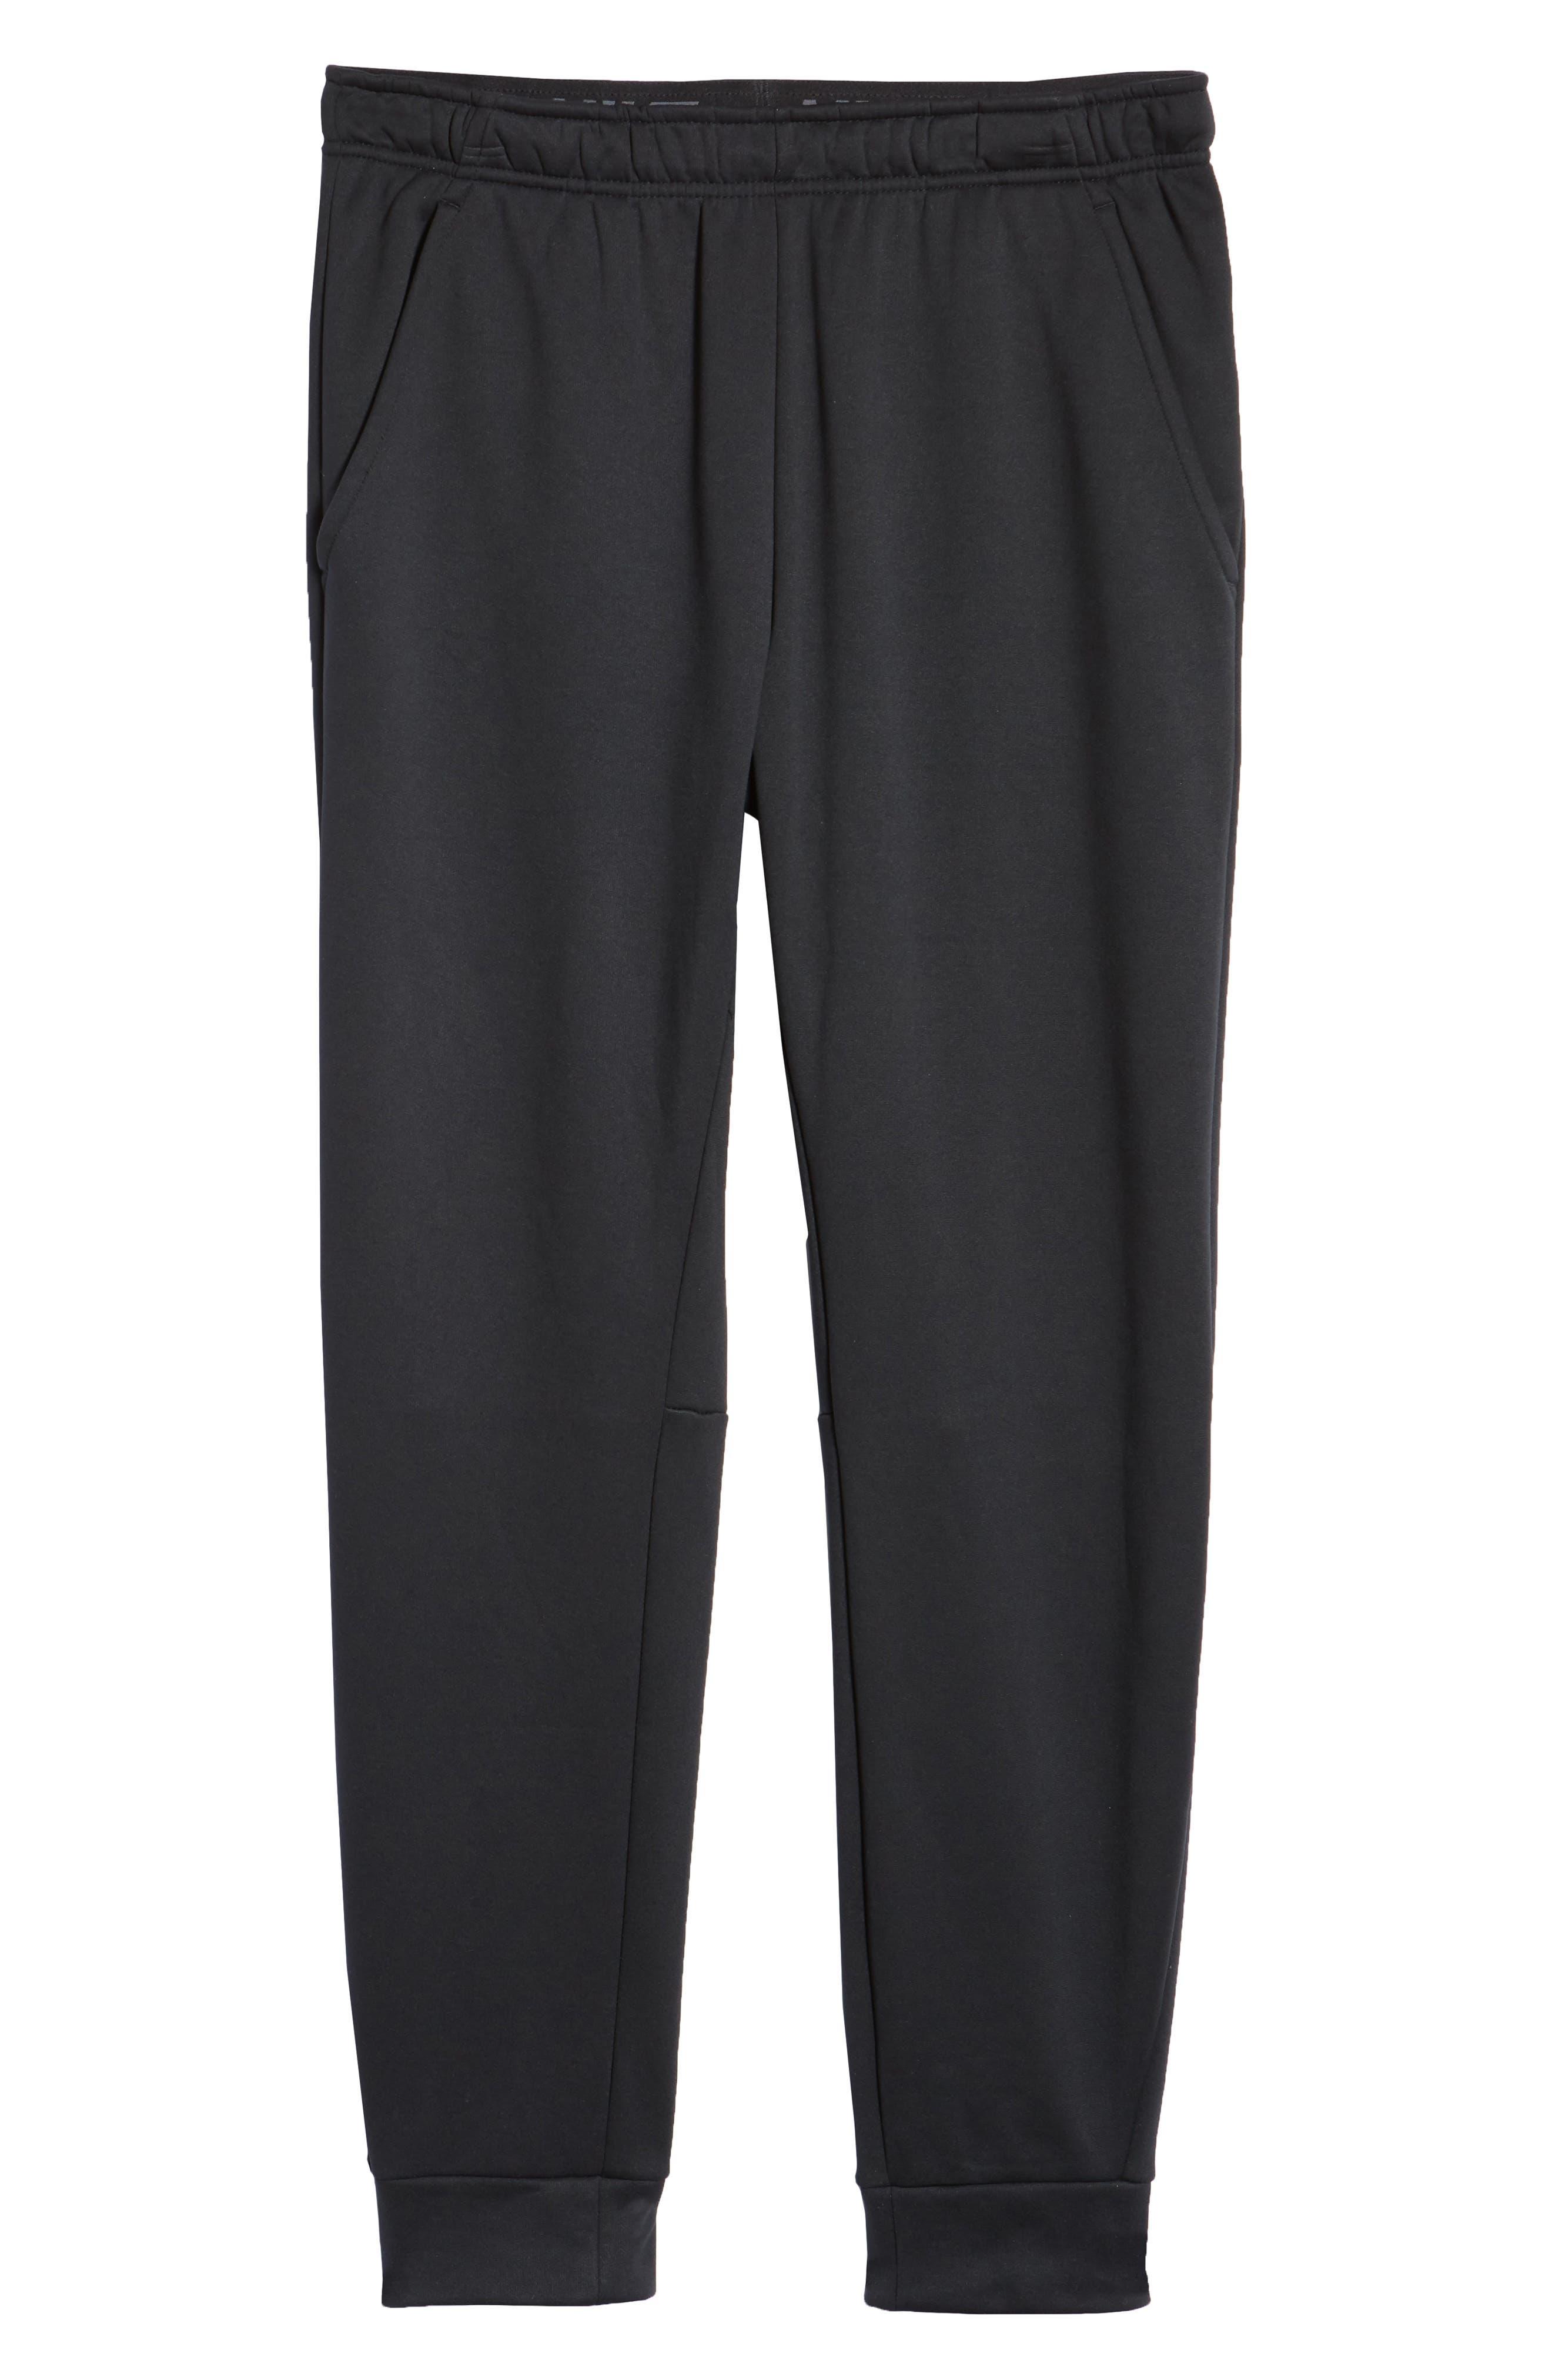 NIKE, Therma Tapered Pants, Alternate thumbnail 7, color, BLACK/ WHITE